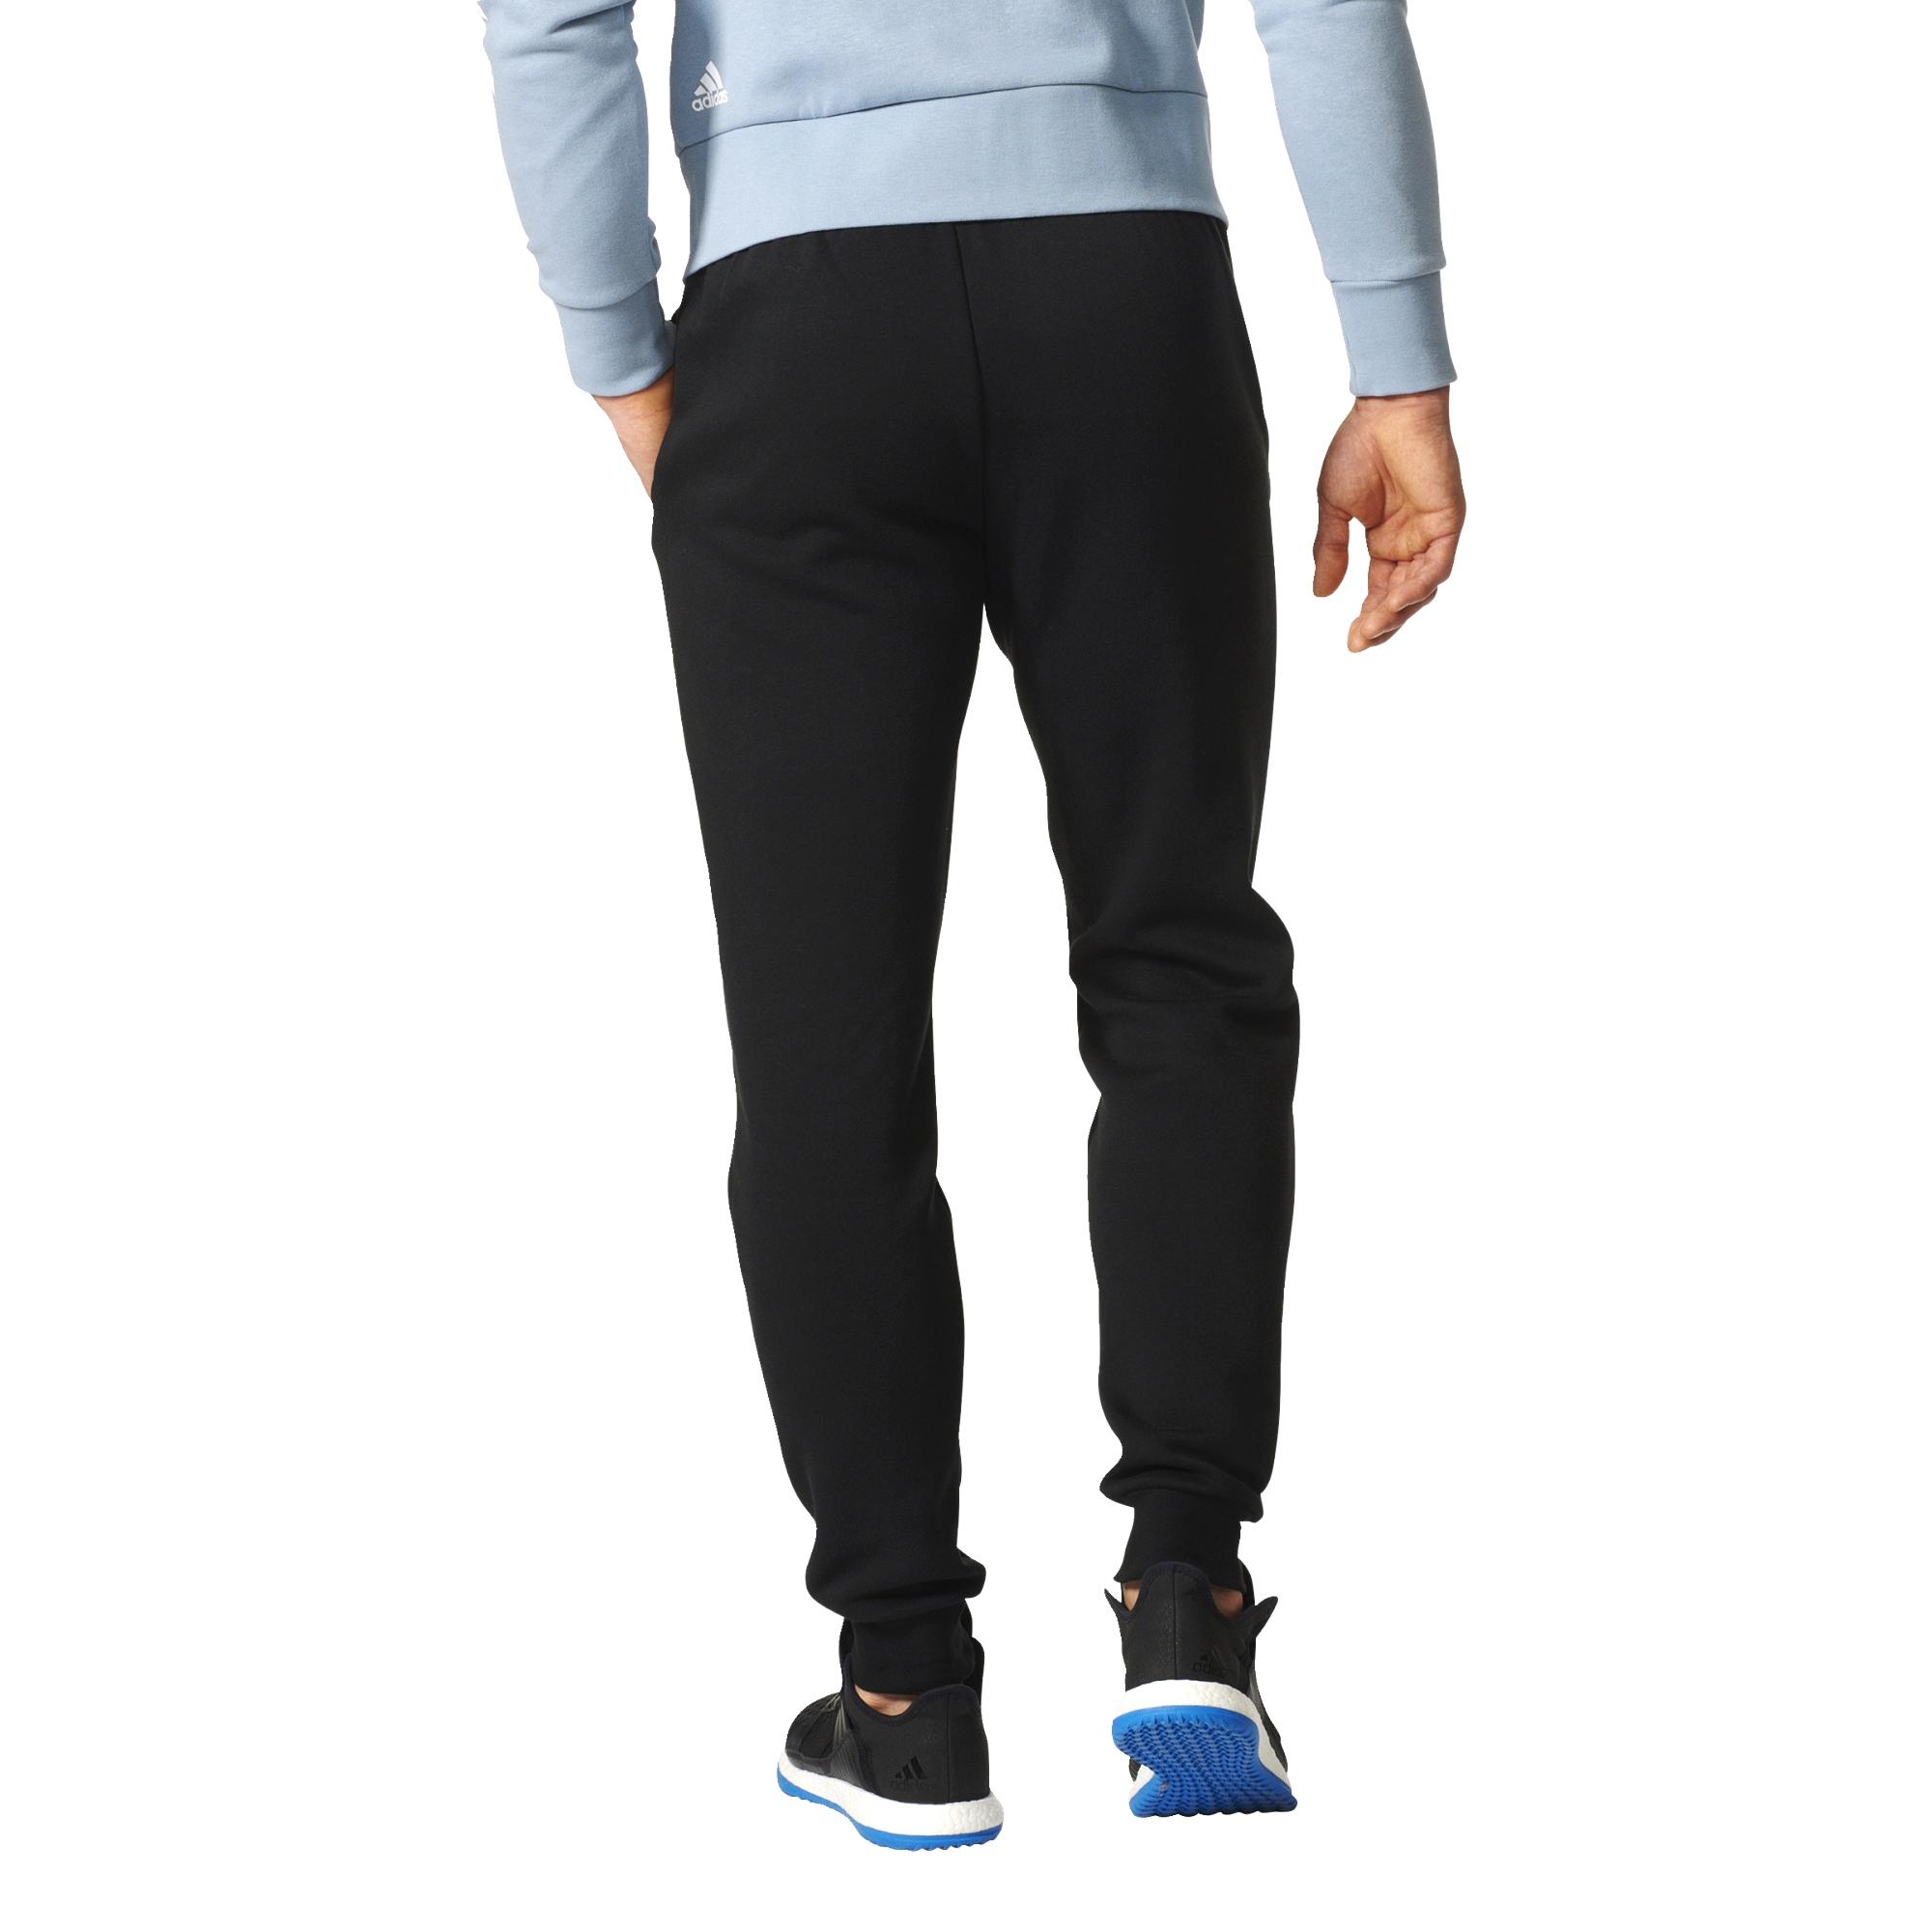 Pantalon de survêtement Adidas Performance Essentials Tapered Fleece Pants